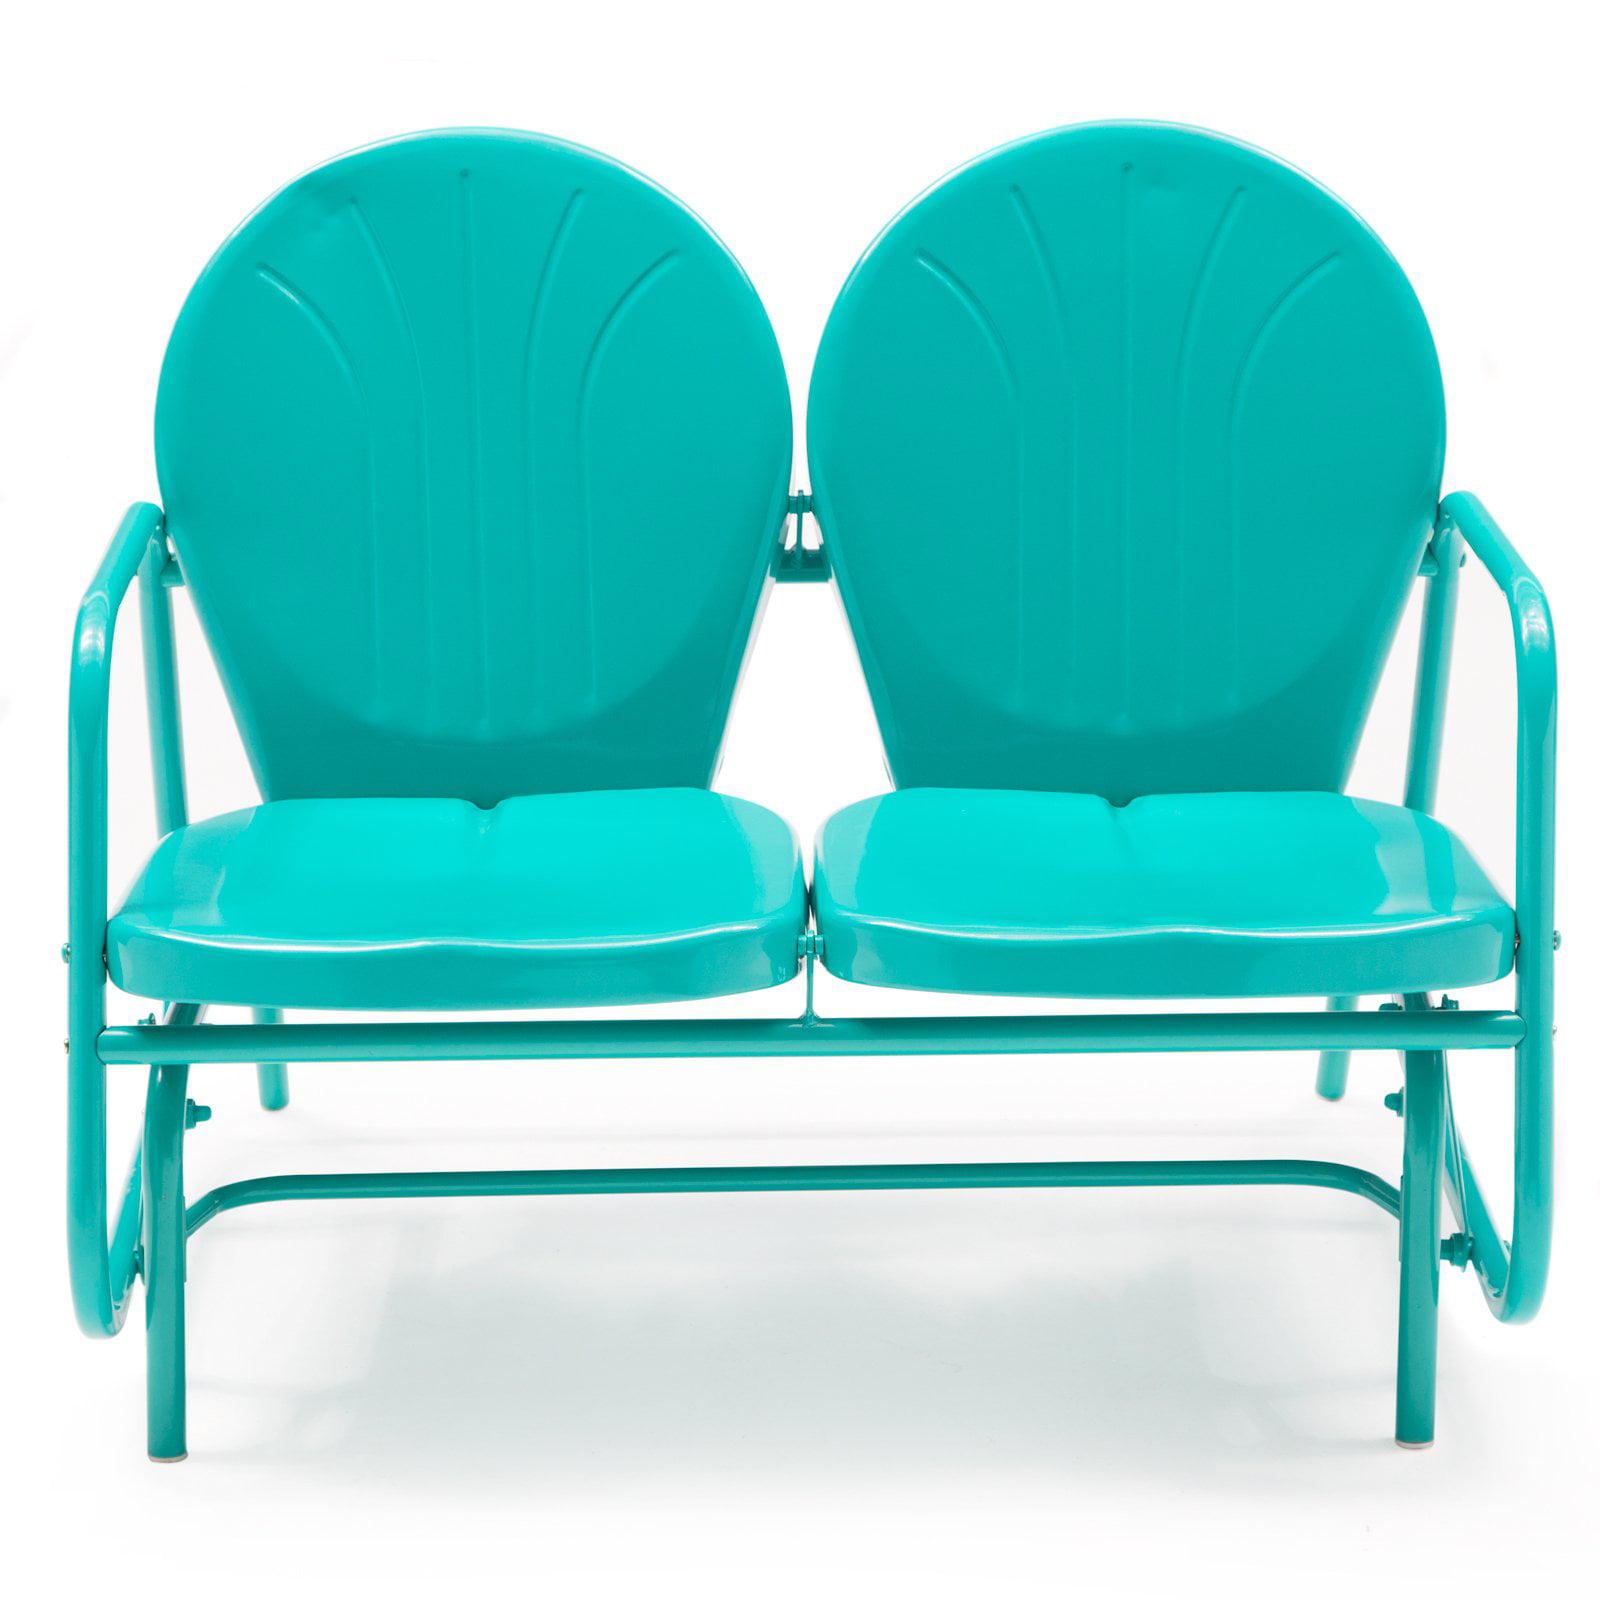 Retro outdoor chairs - Retro Outdoor Chairs